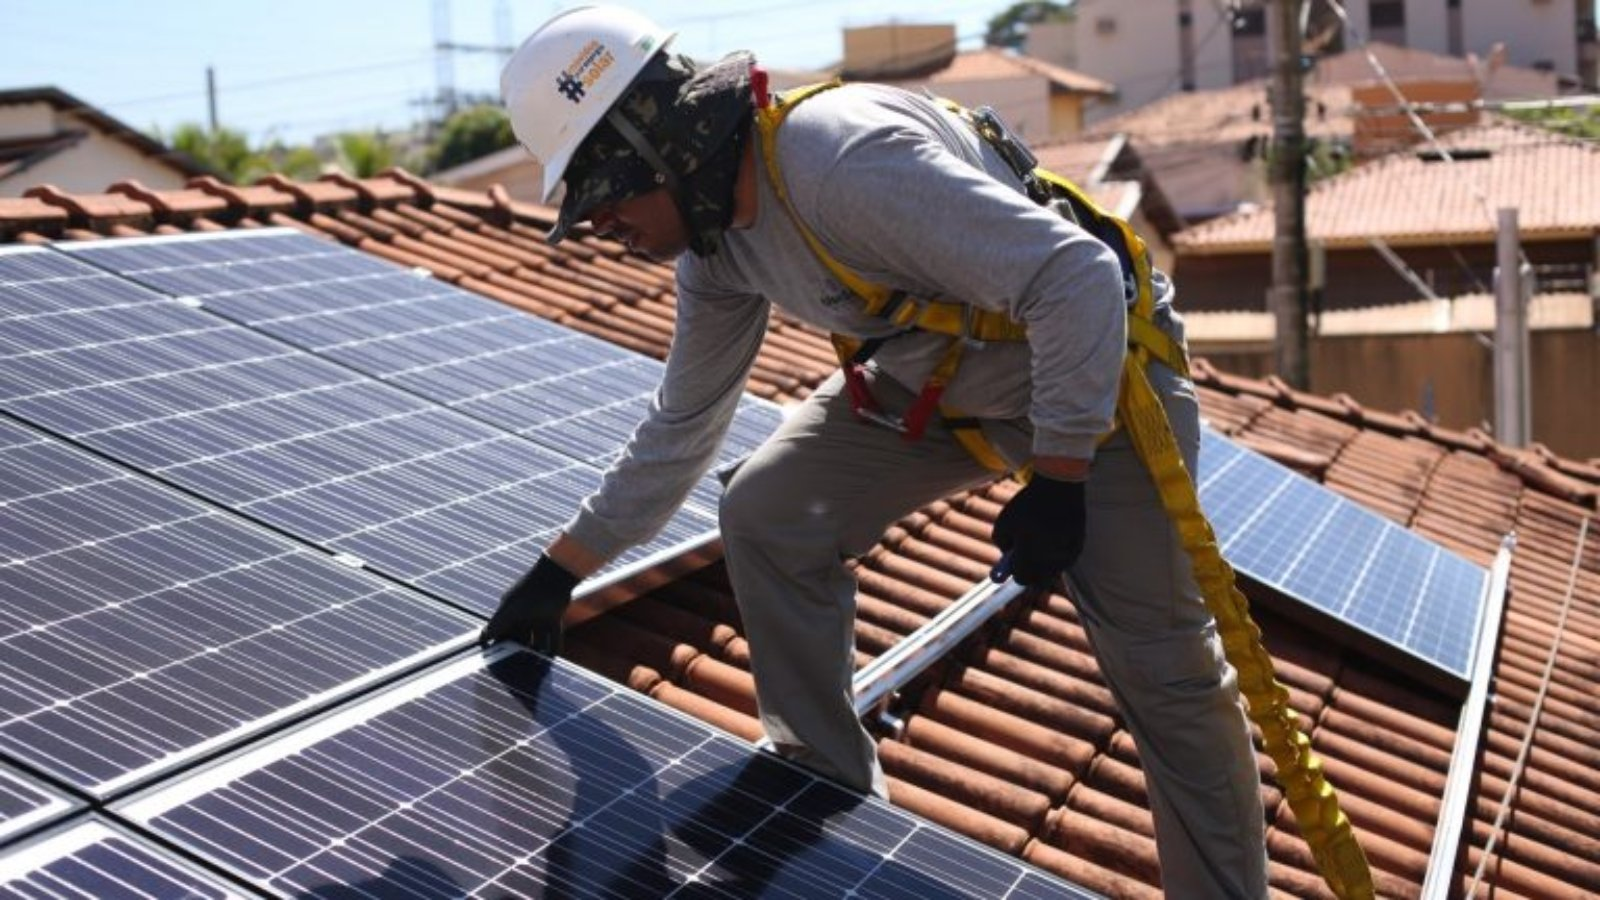 31-05 FOTO DE SISTEMA DE ENERGIA